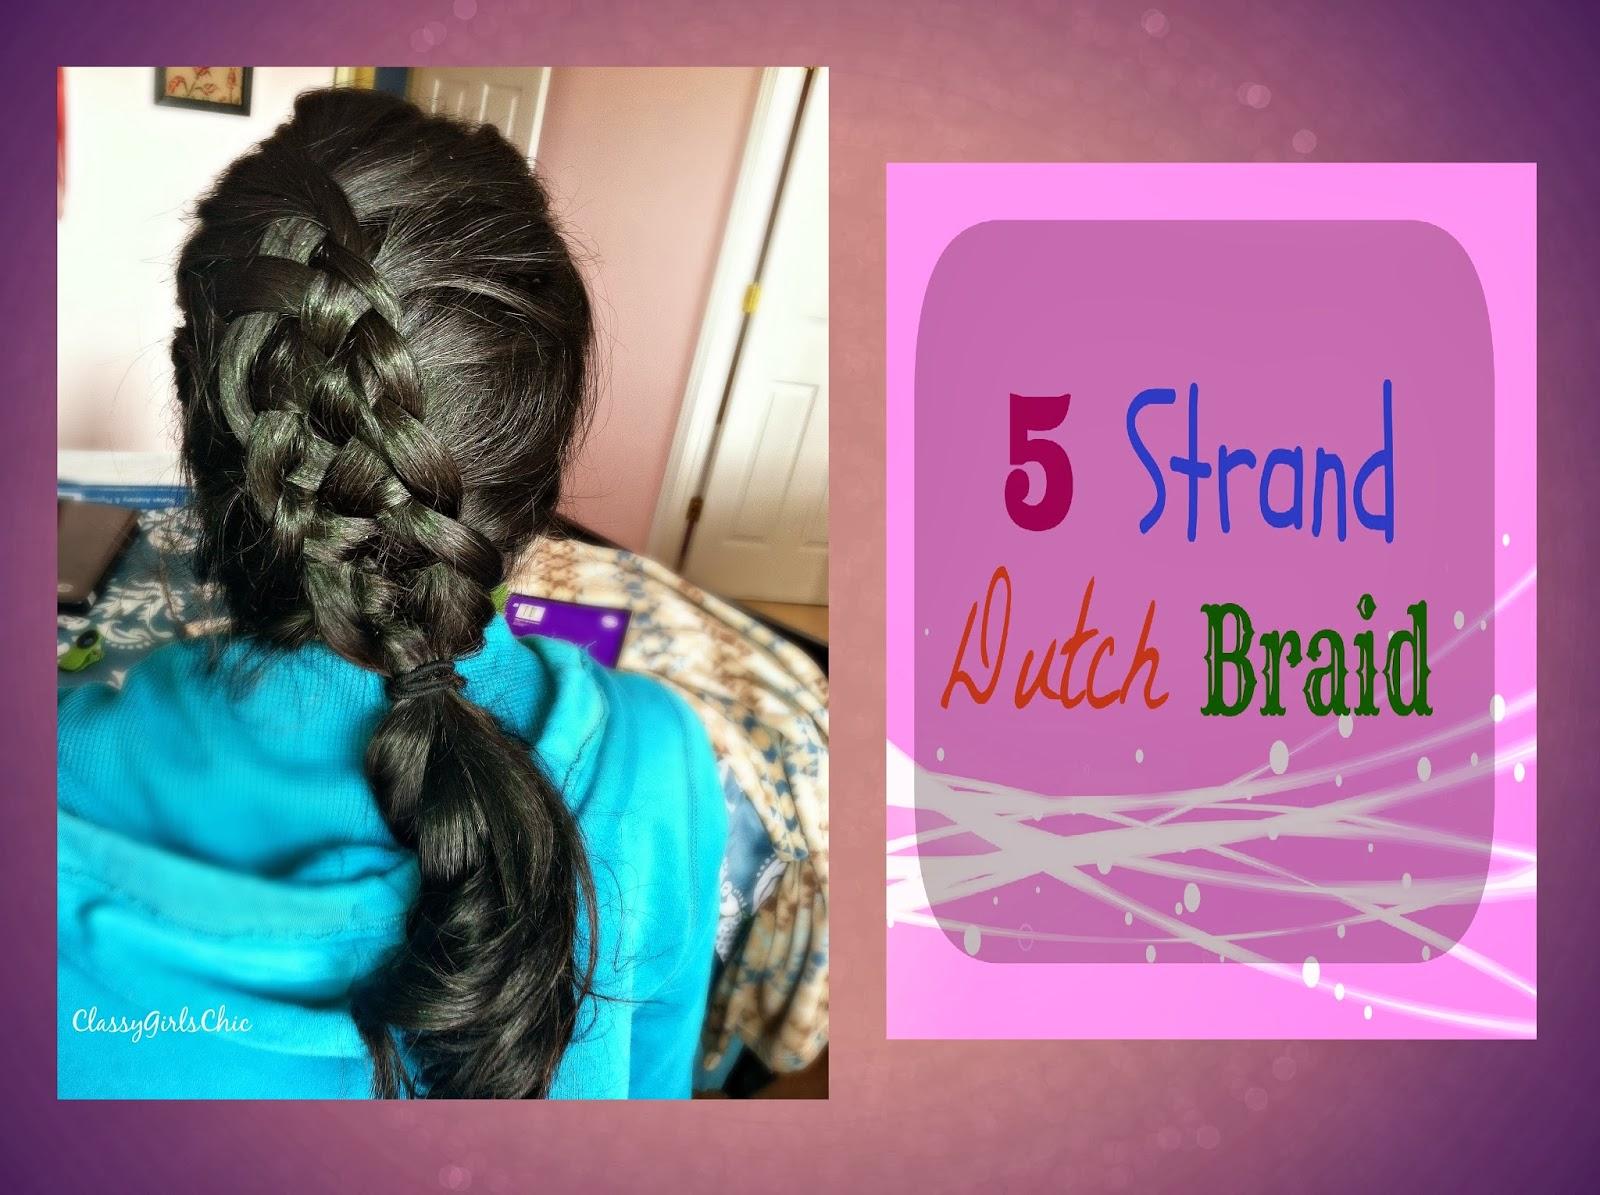 5 Strand Dutch